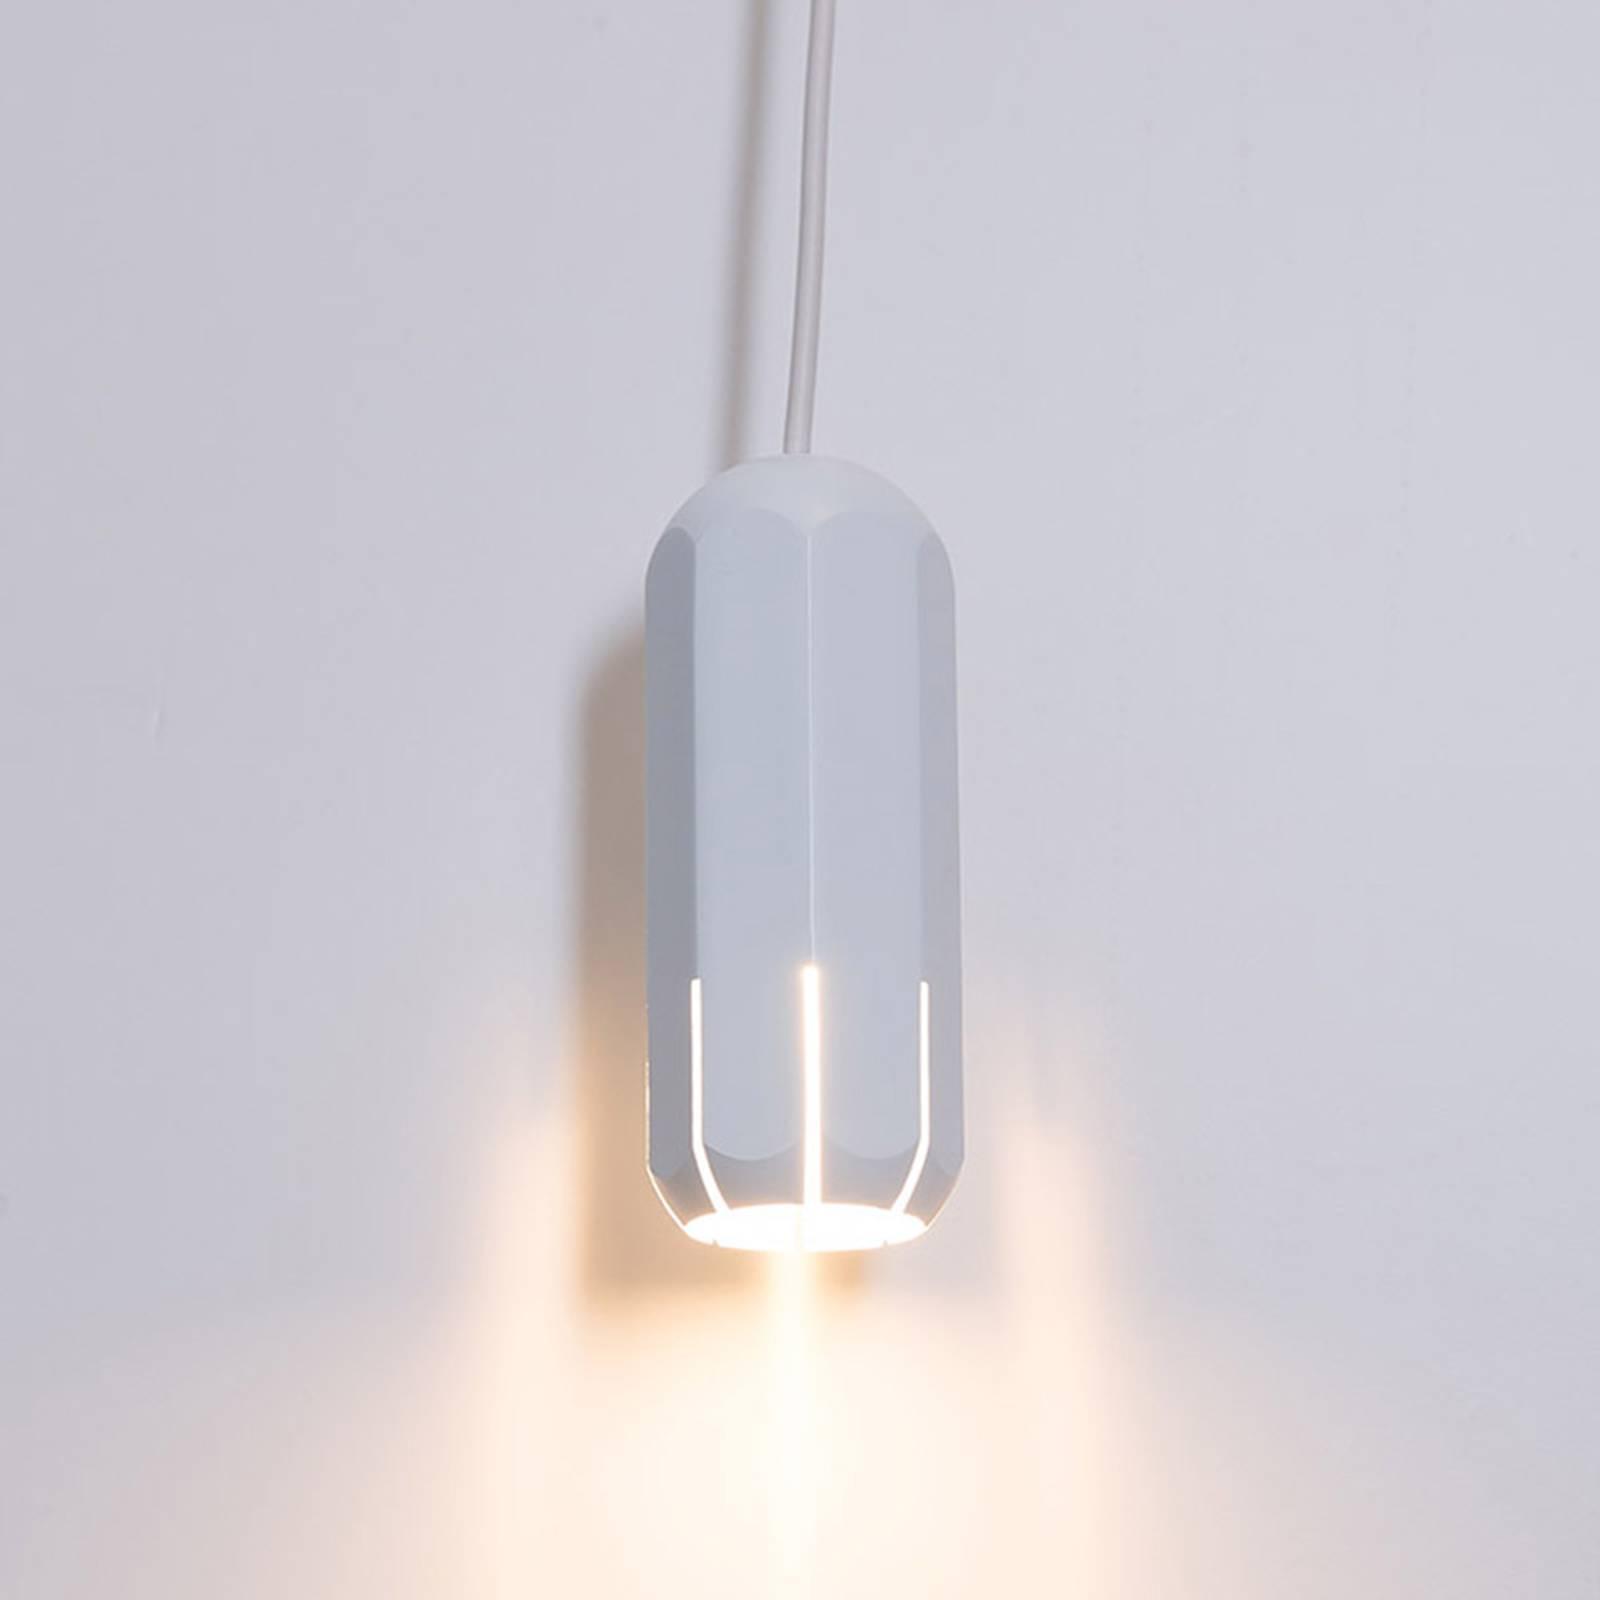 Innermost Brixton spot 11 LED hanglamp, wit